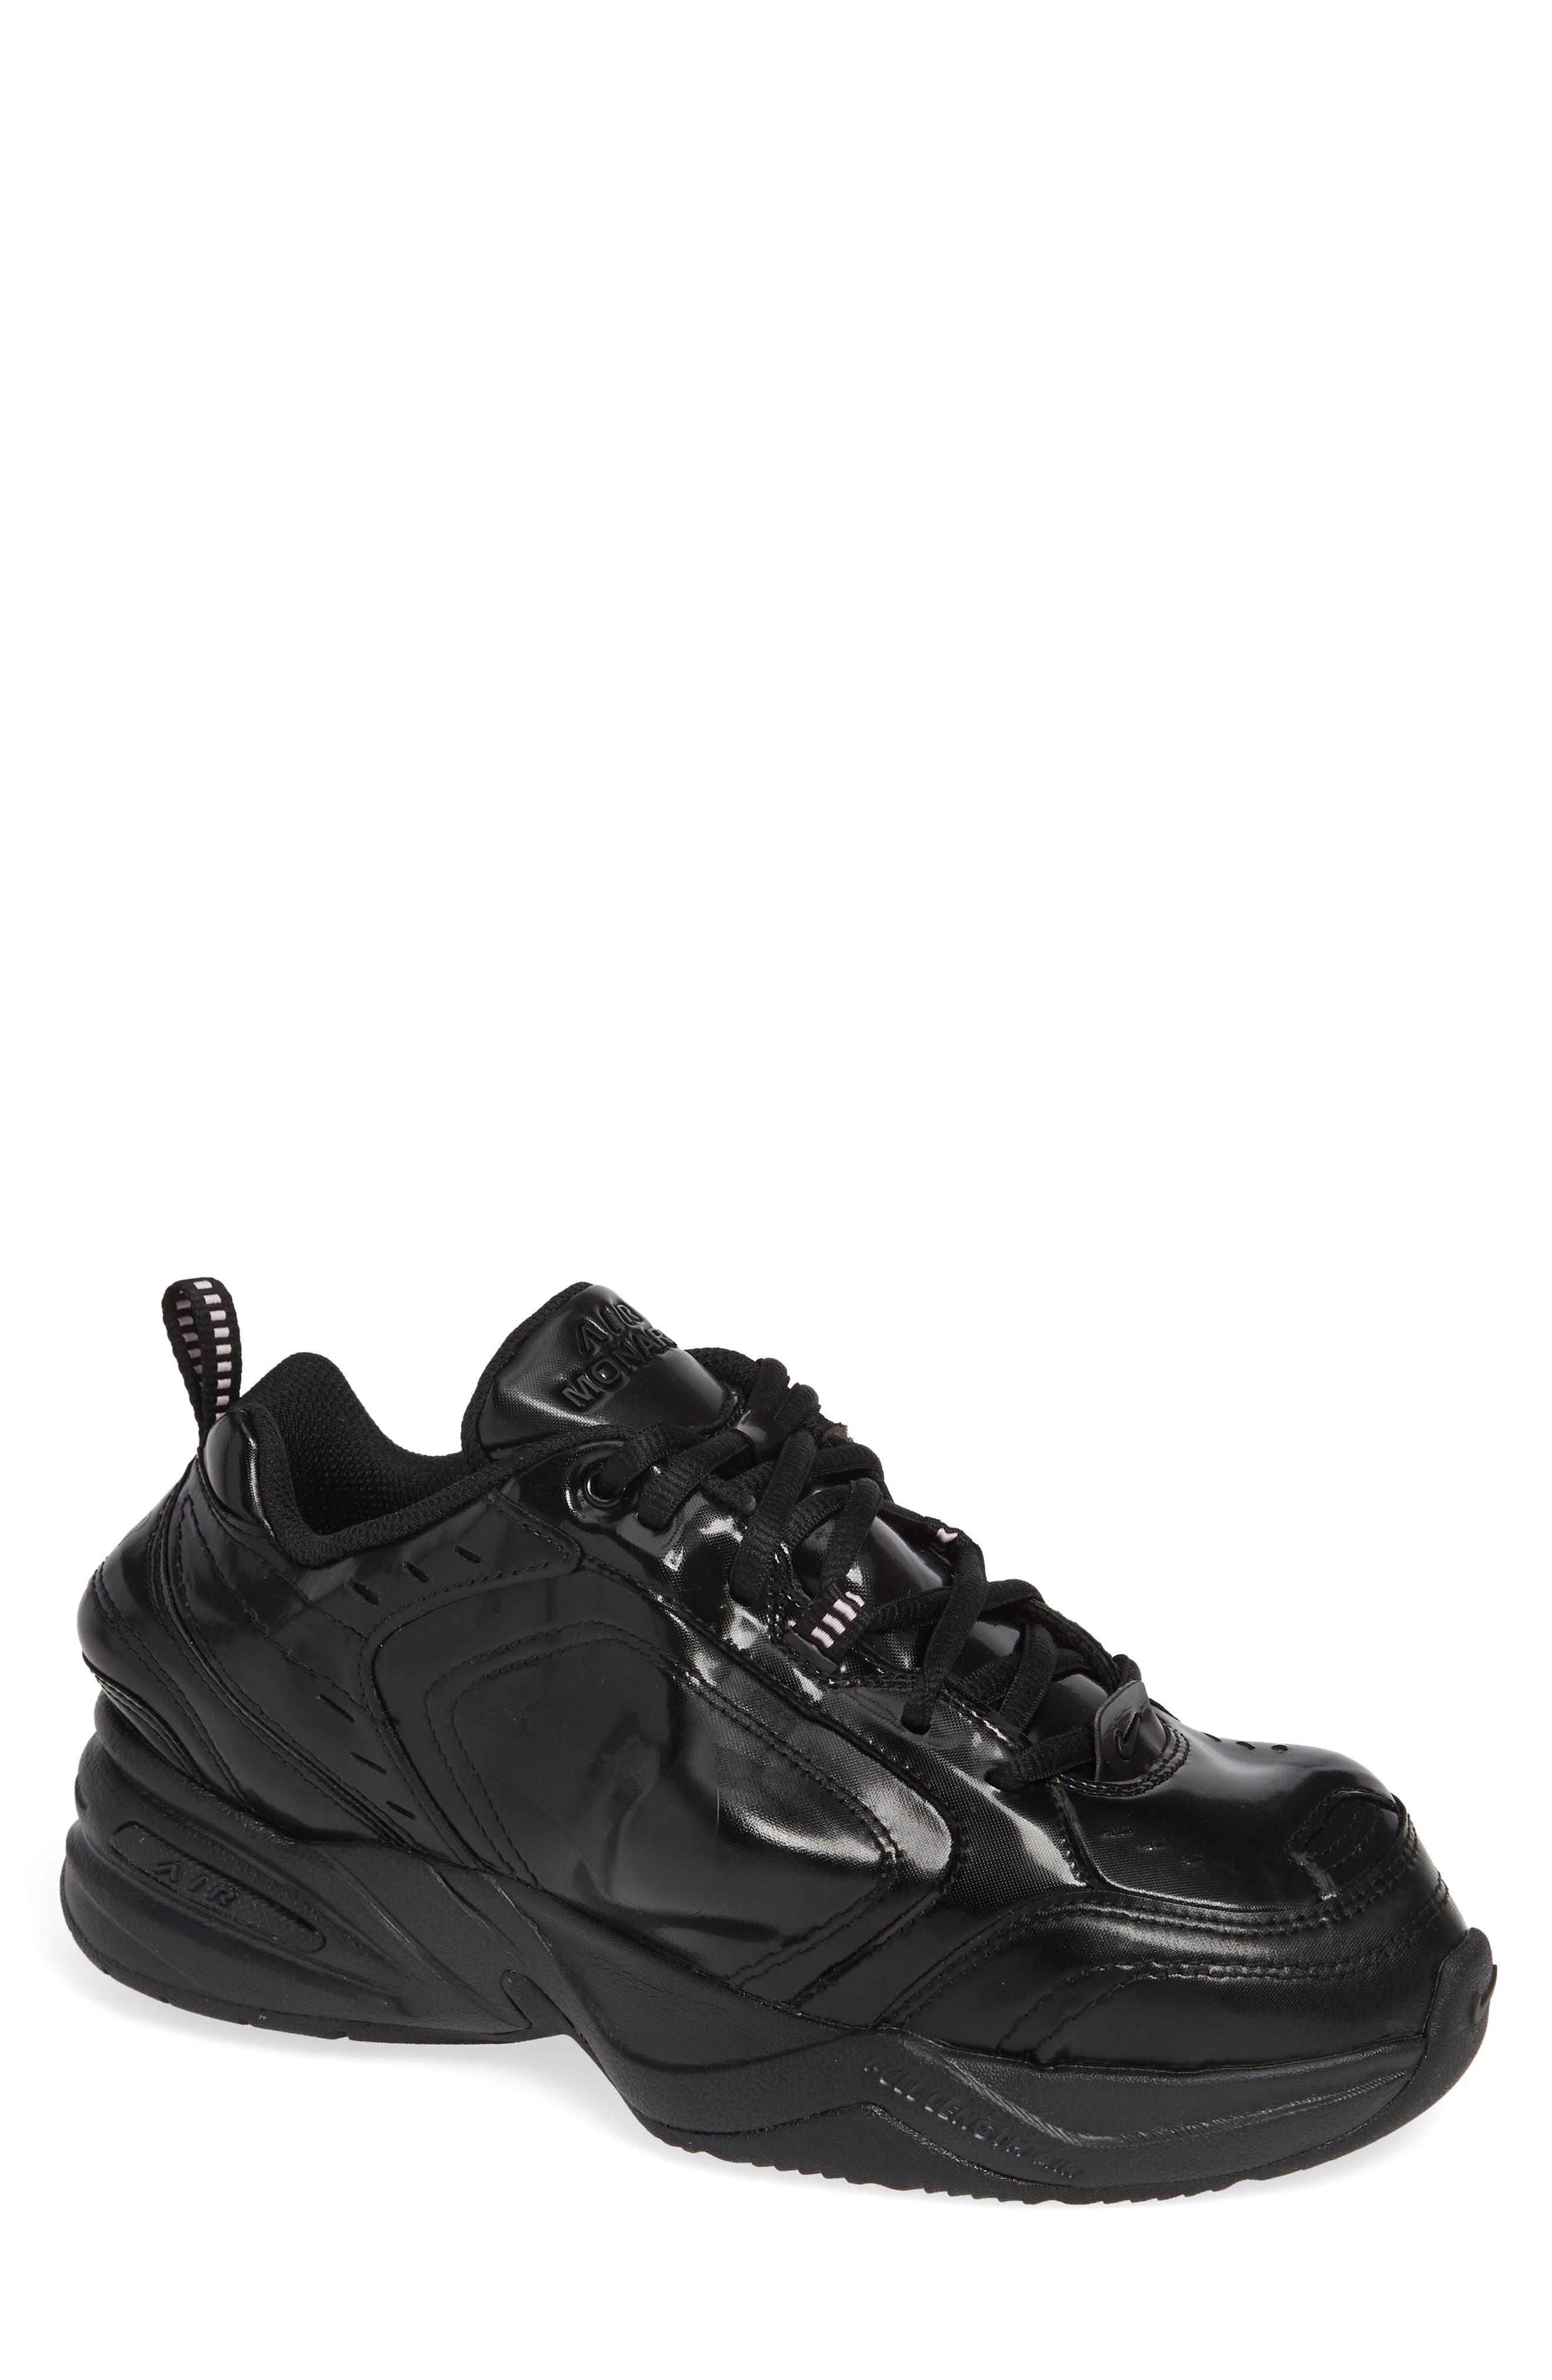 x Martine Rose Air Monarch IV Sneaker,                         Main,                         color, BLACK/ SOFT PINK